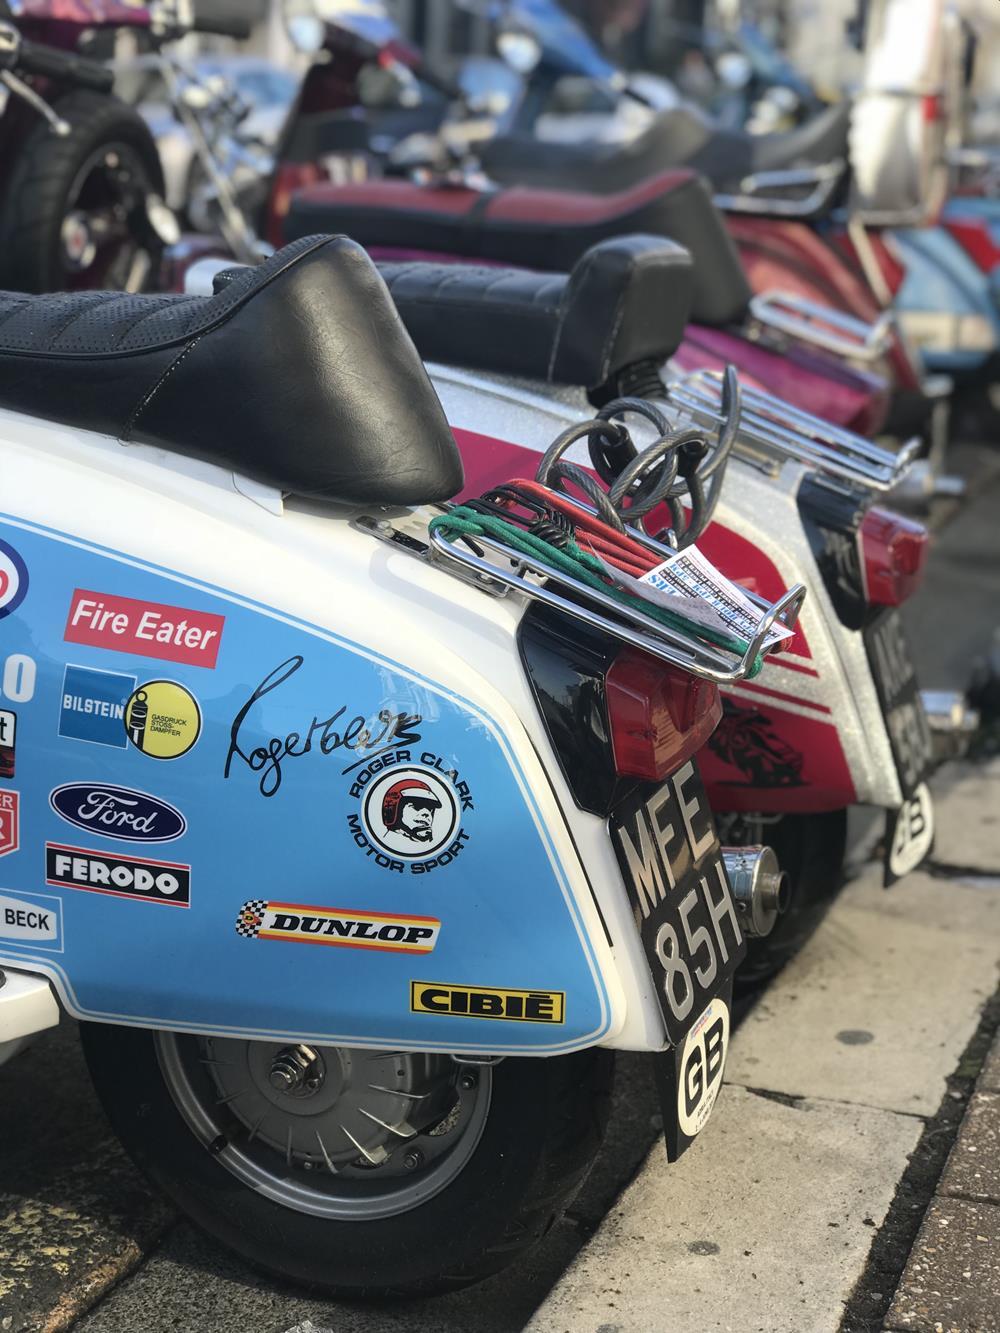 Street racer style Lambretta